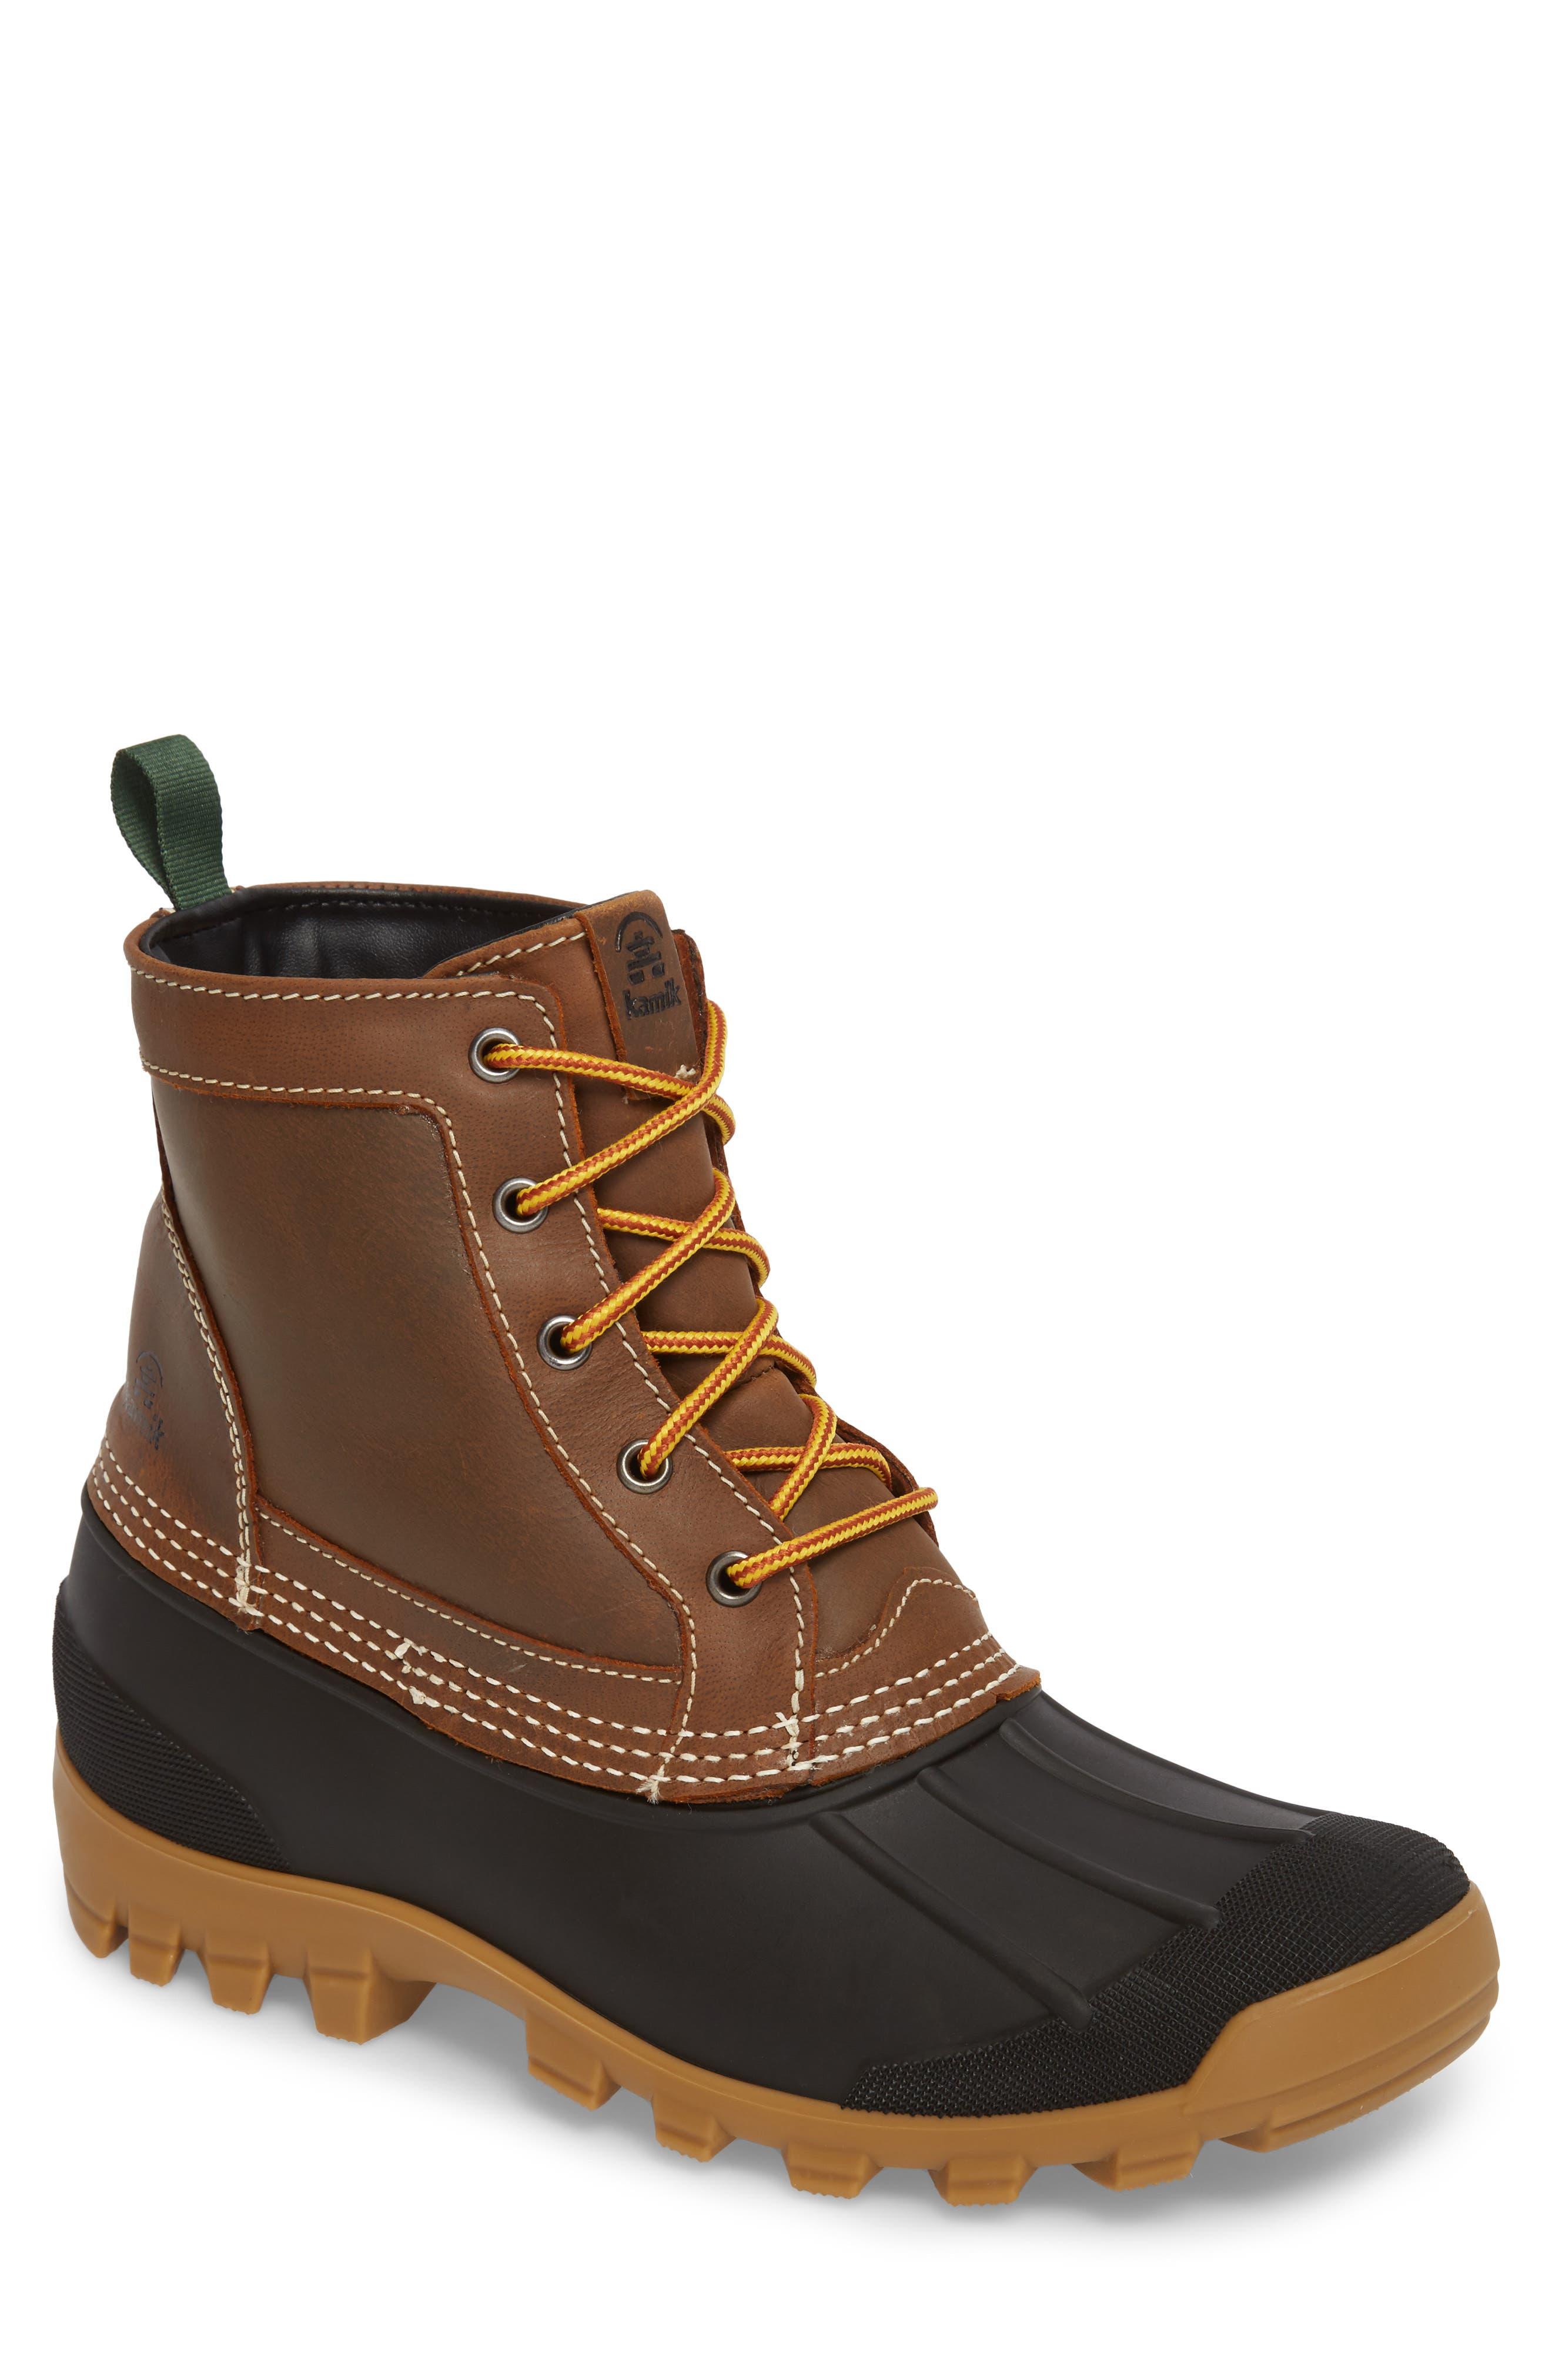 Yukon 5 Waterproof Insulated Three-Season Boot,                         Main,                         color, 201